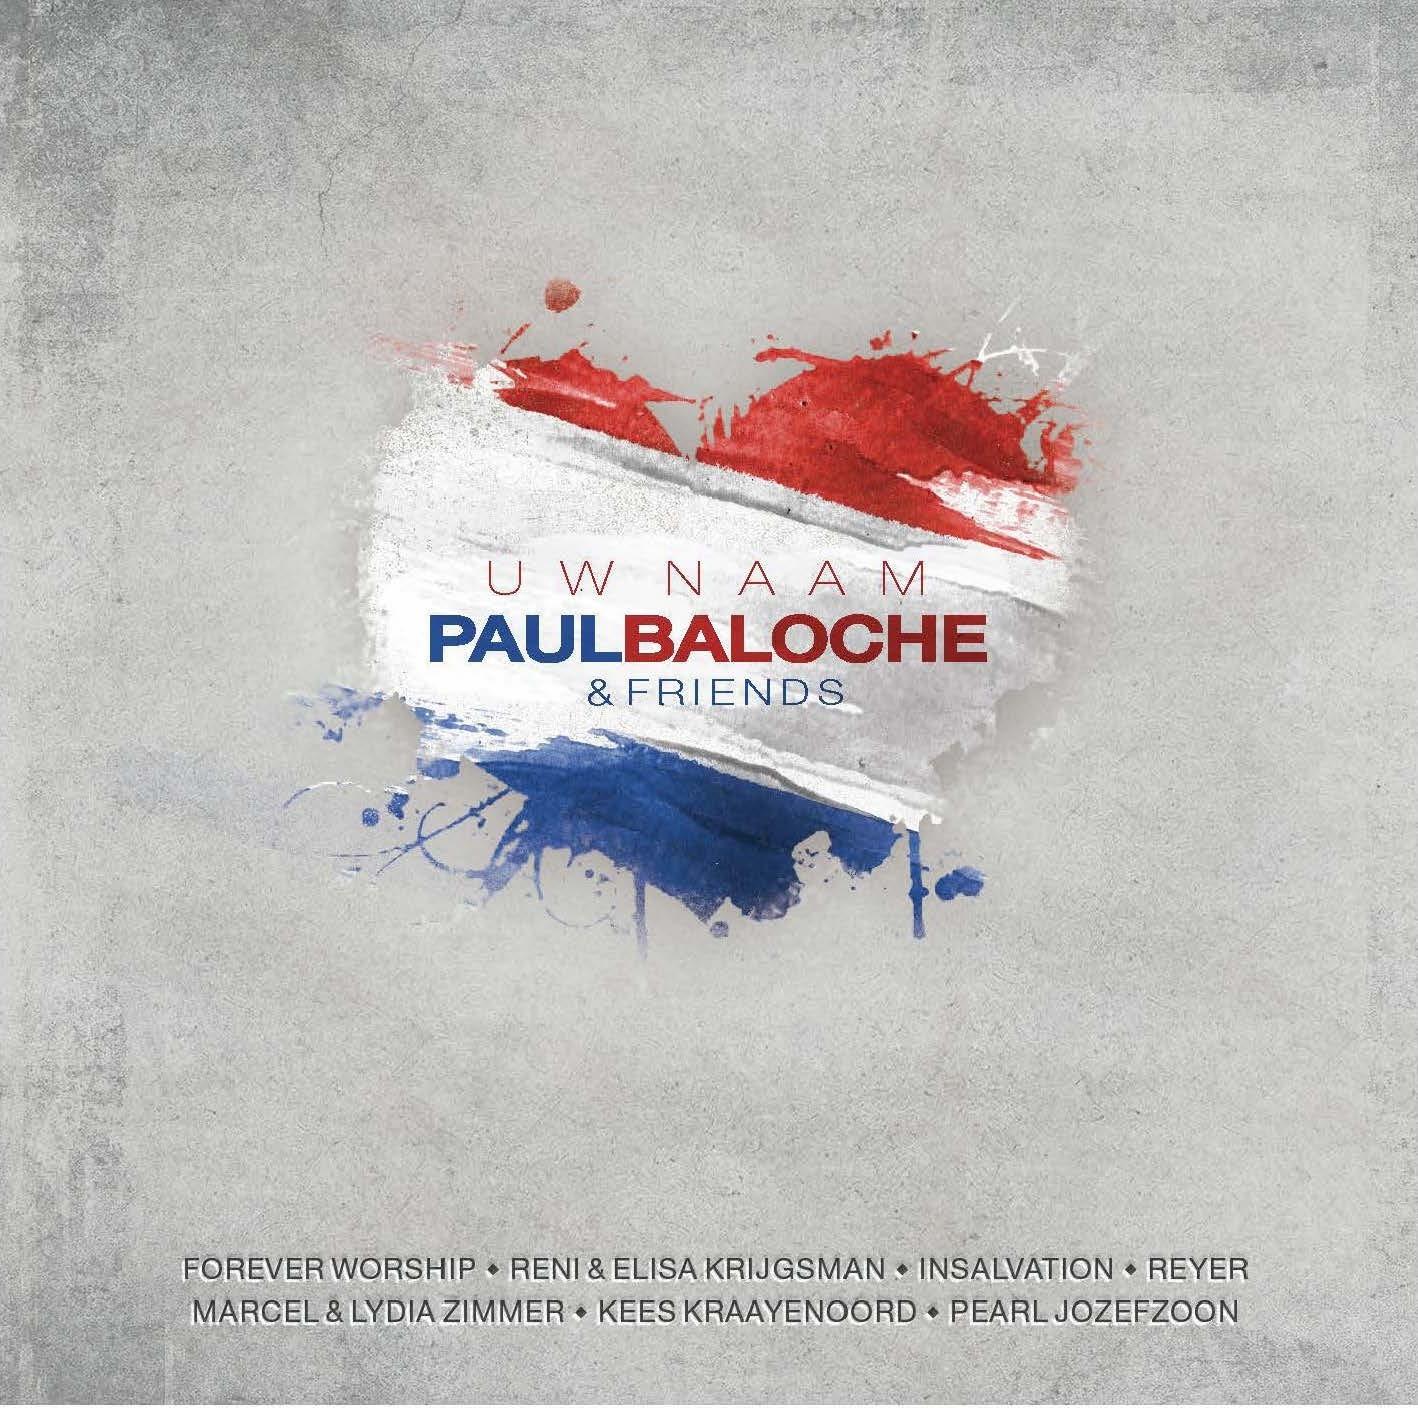 Capa do disco holandês de Paul Baloche, Uw Naam